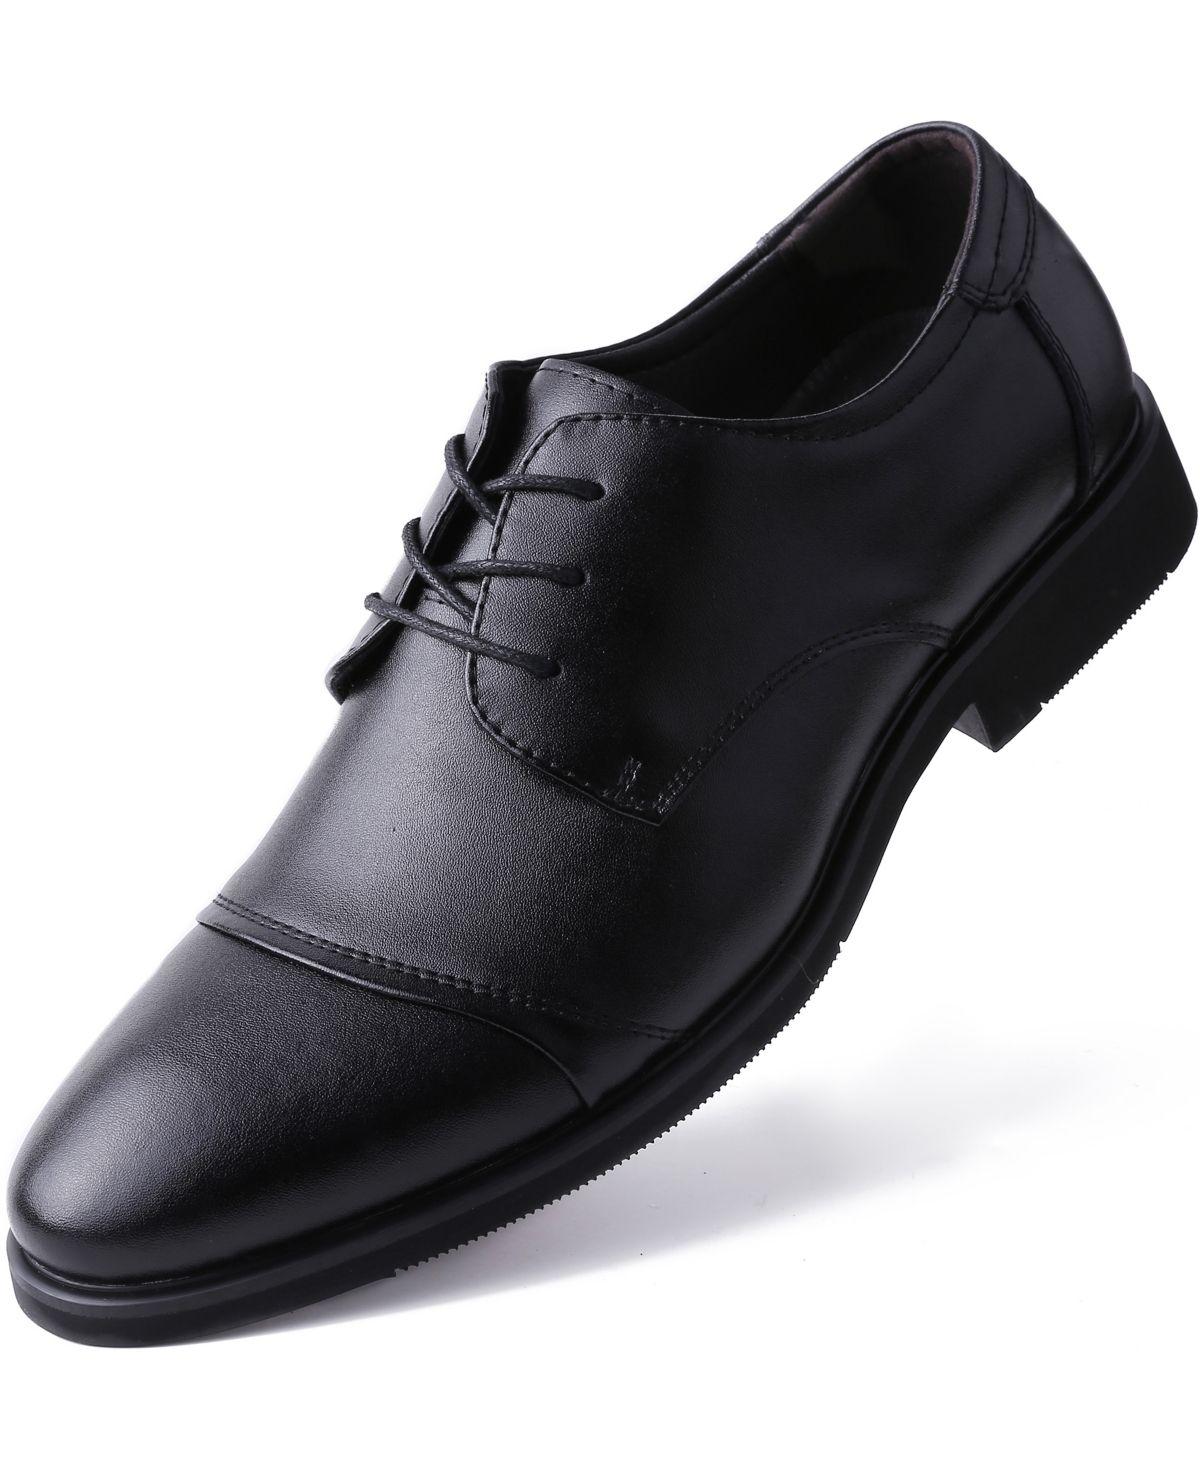 24+ Apt 9 zachary mens dress shoes ideas